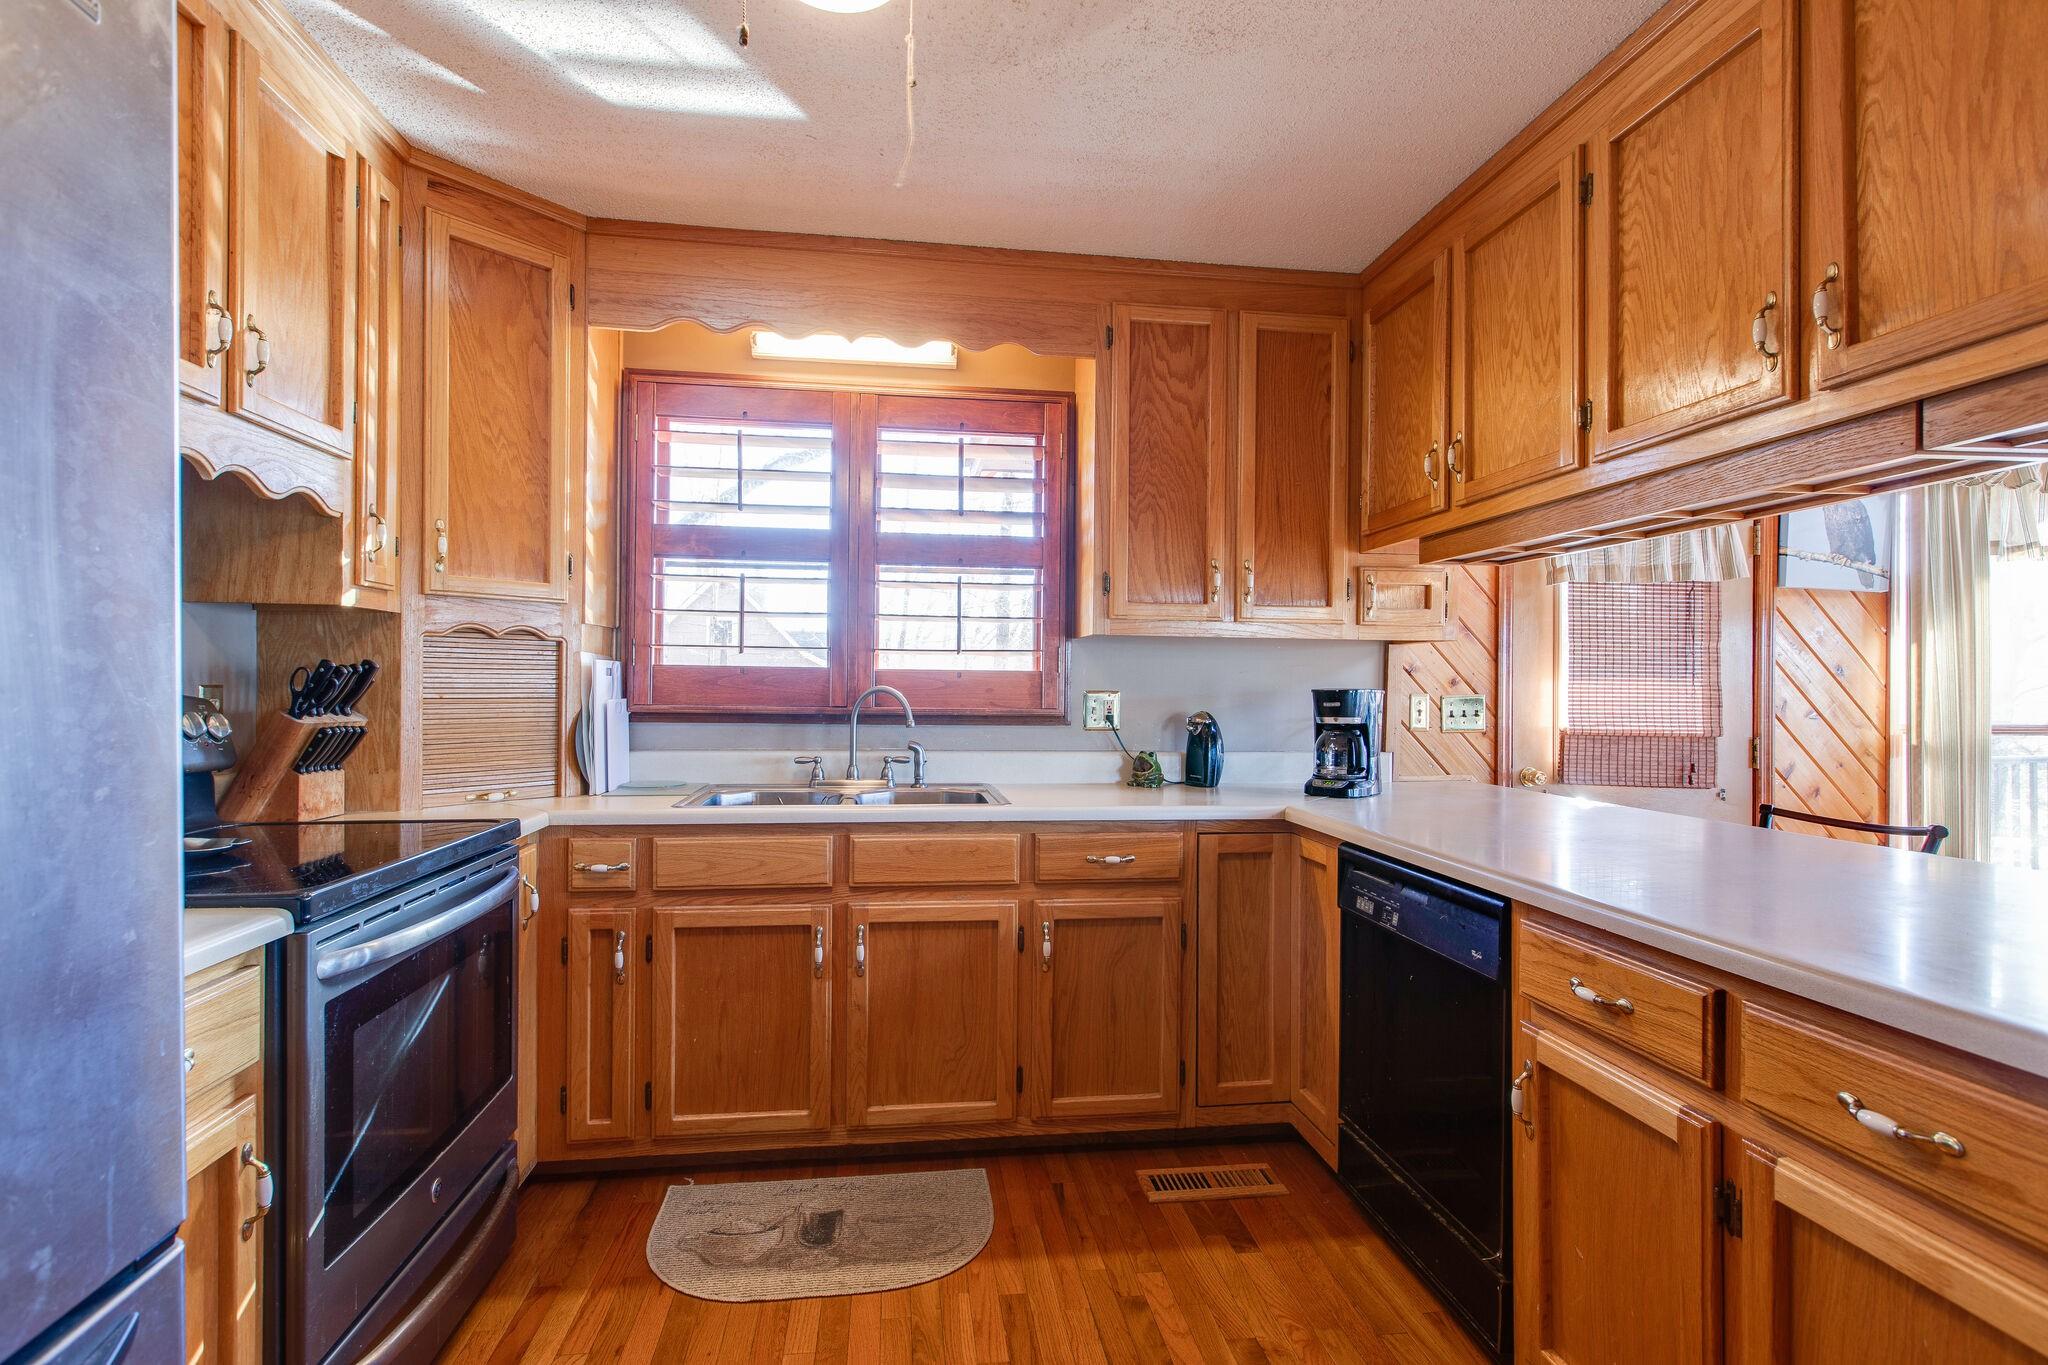 500 Clear Creek Cir, Pulaski, Tennessee 38478, 4 Bedrooms Bedrooms, ,3 BathroomsBathrooms,Single Family,For Sale,500 Clear Creek Cir,3,2226893